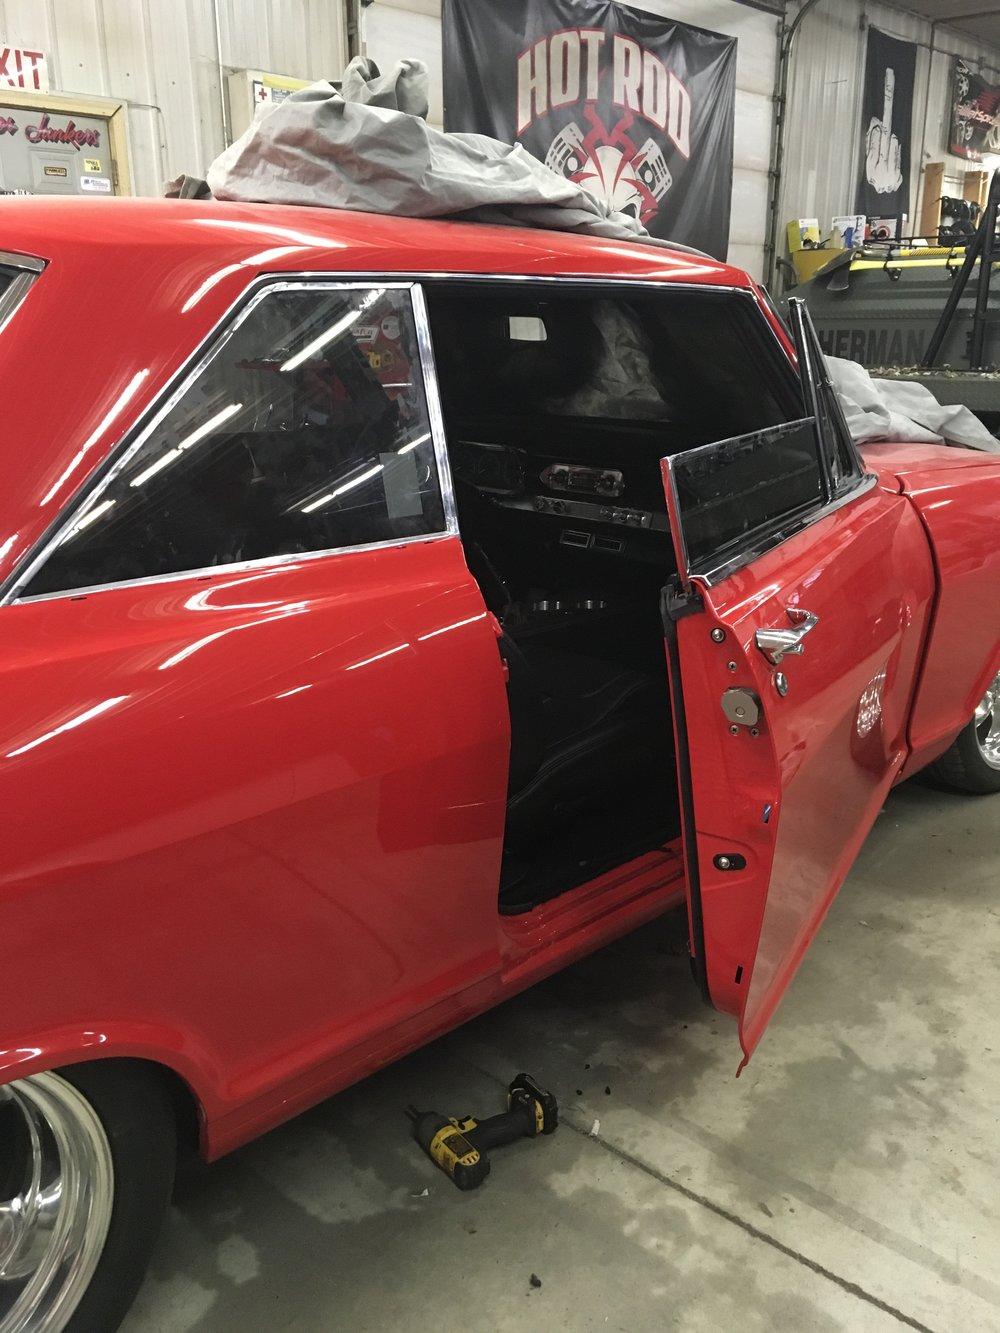 minneapolis-hot-rod-restoration-65-nova-fresh-paint-exterior-hot-rod-factory.jpg